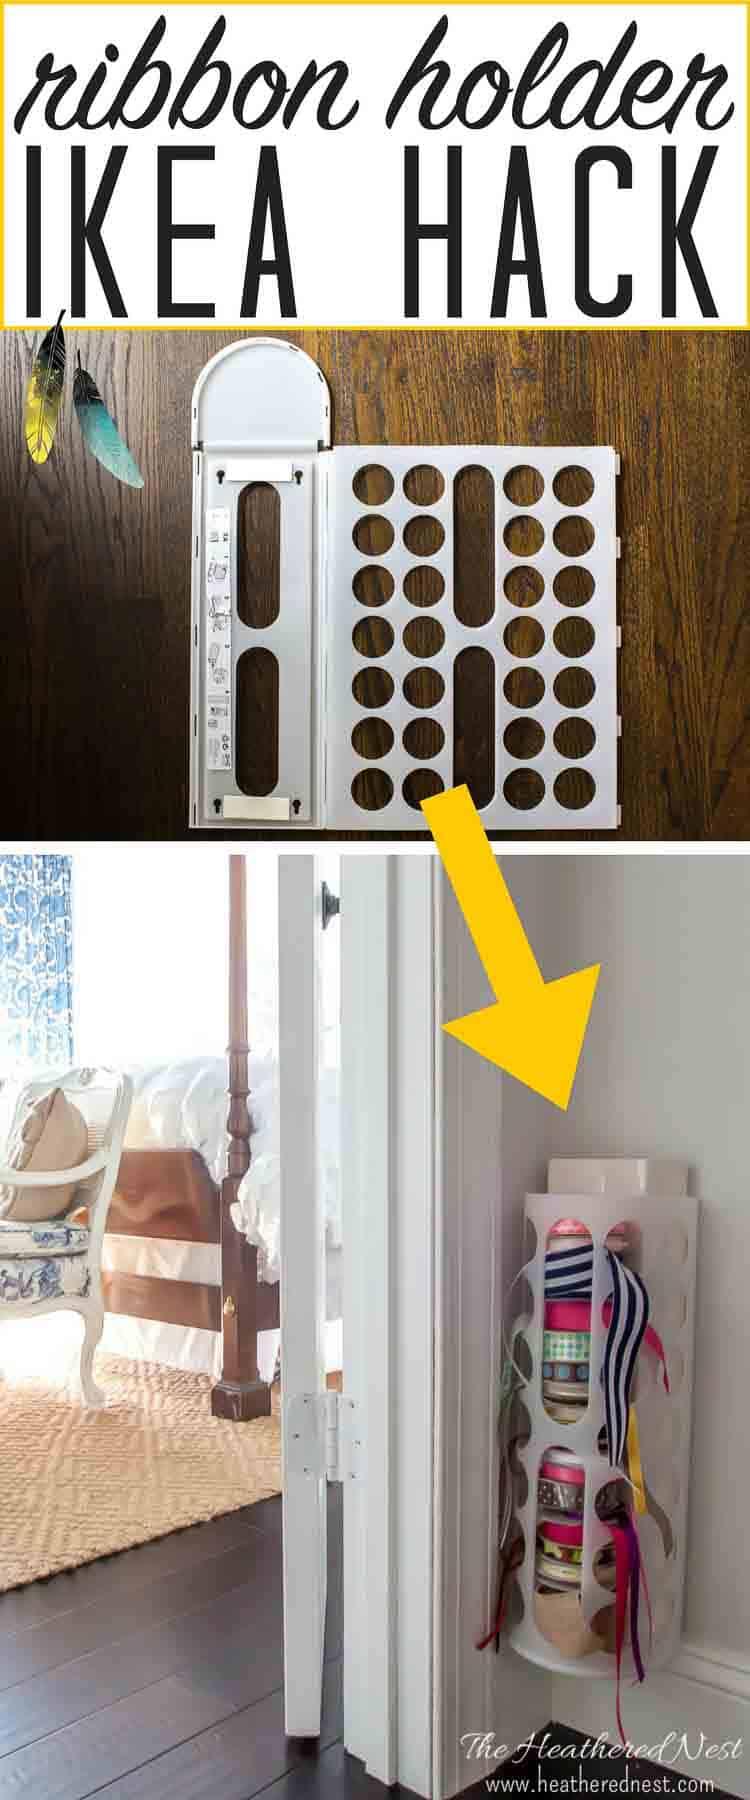 DIY ribbon holder Ikea hack! | The Heathered Nest